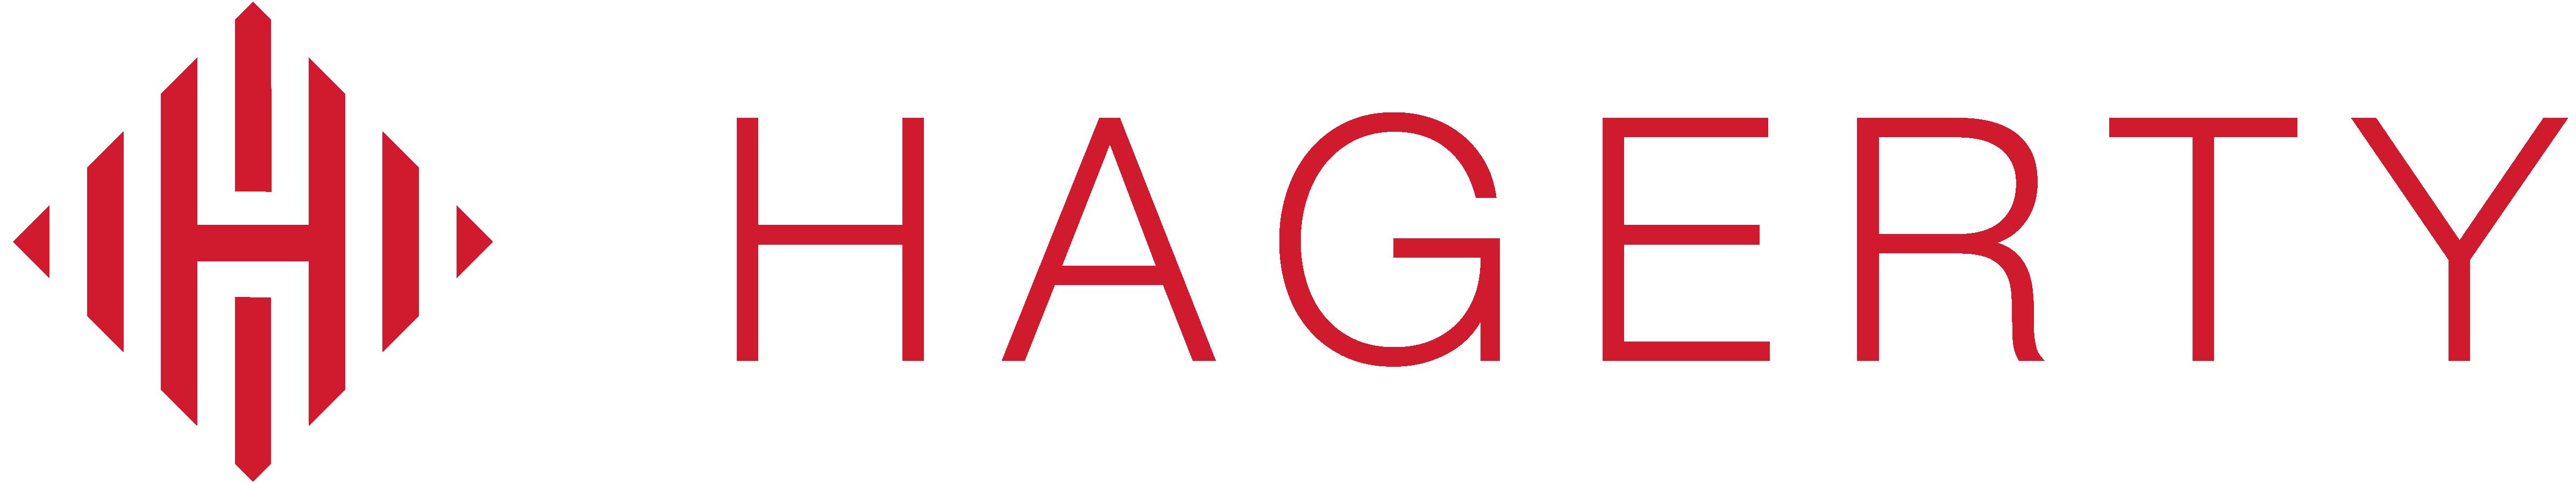 hagerty logo - long